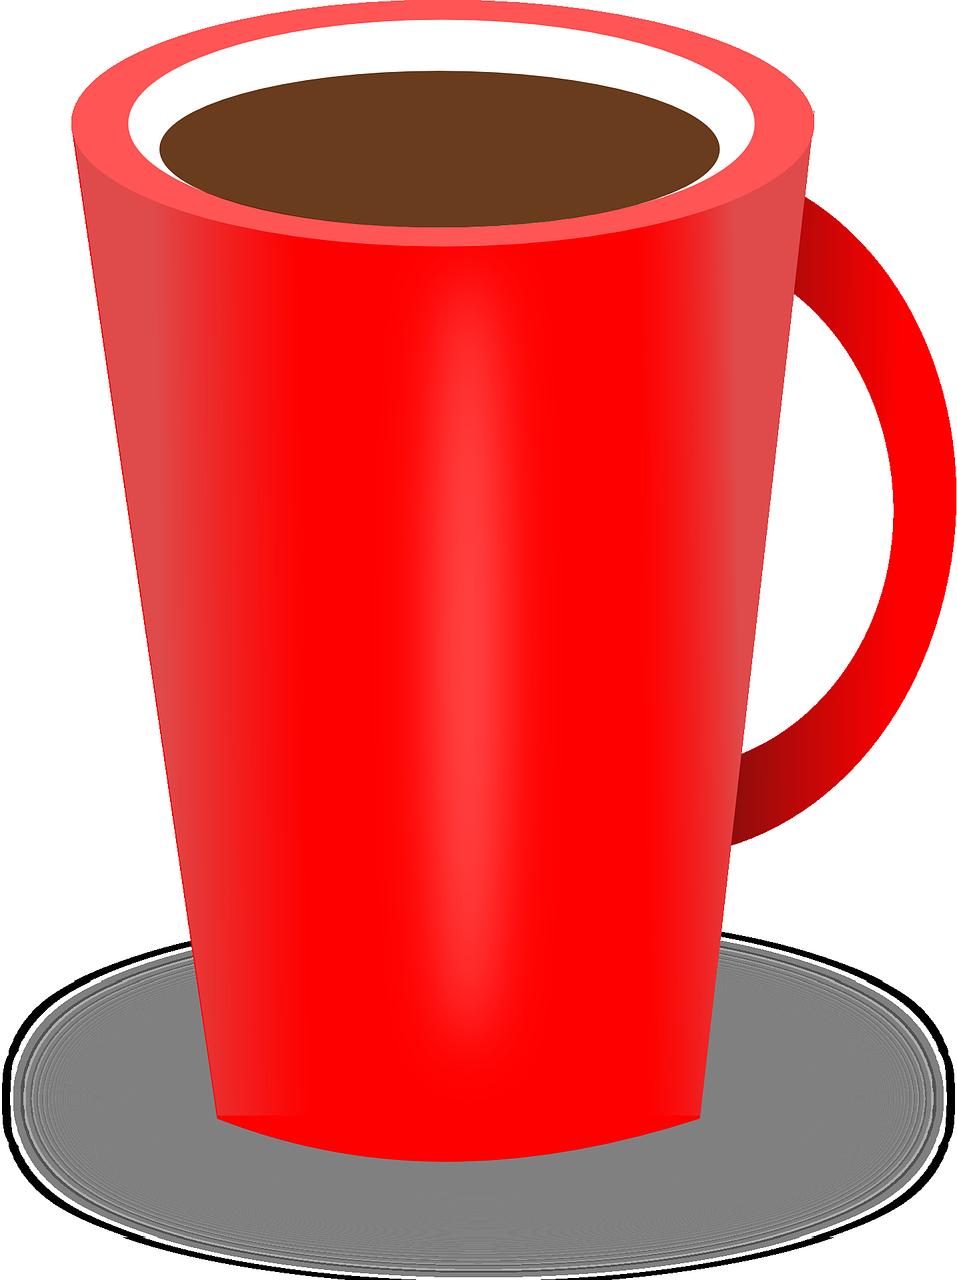 Hot clipart cup joe. Coffee drink tea red